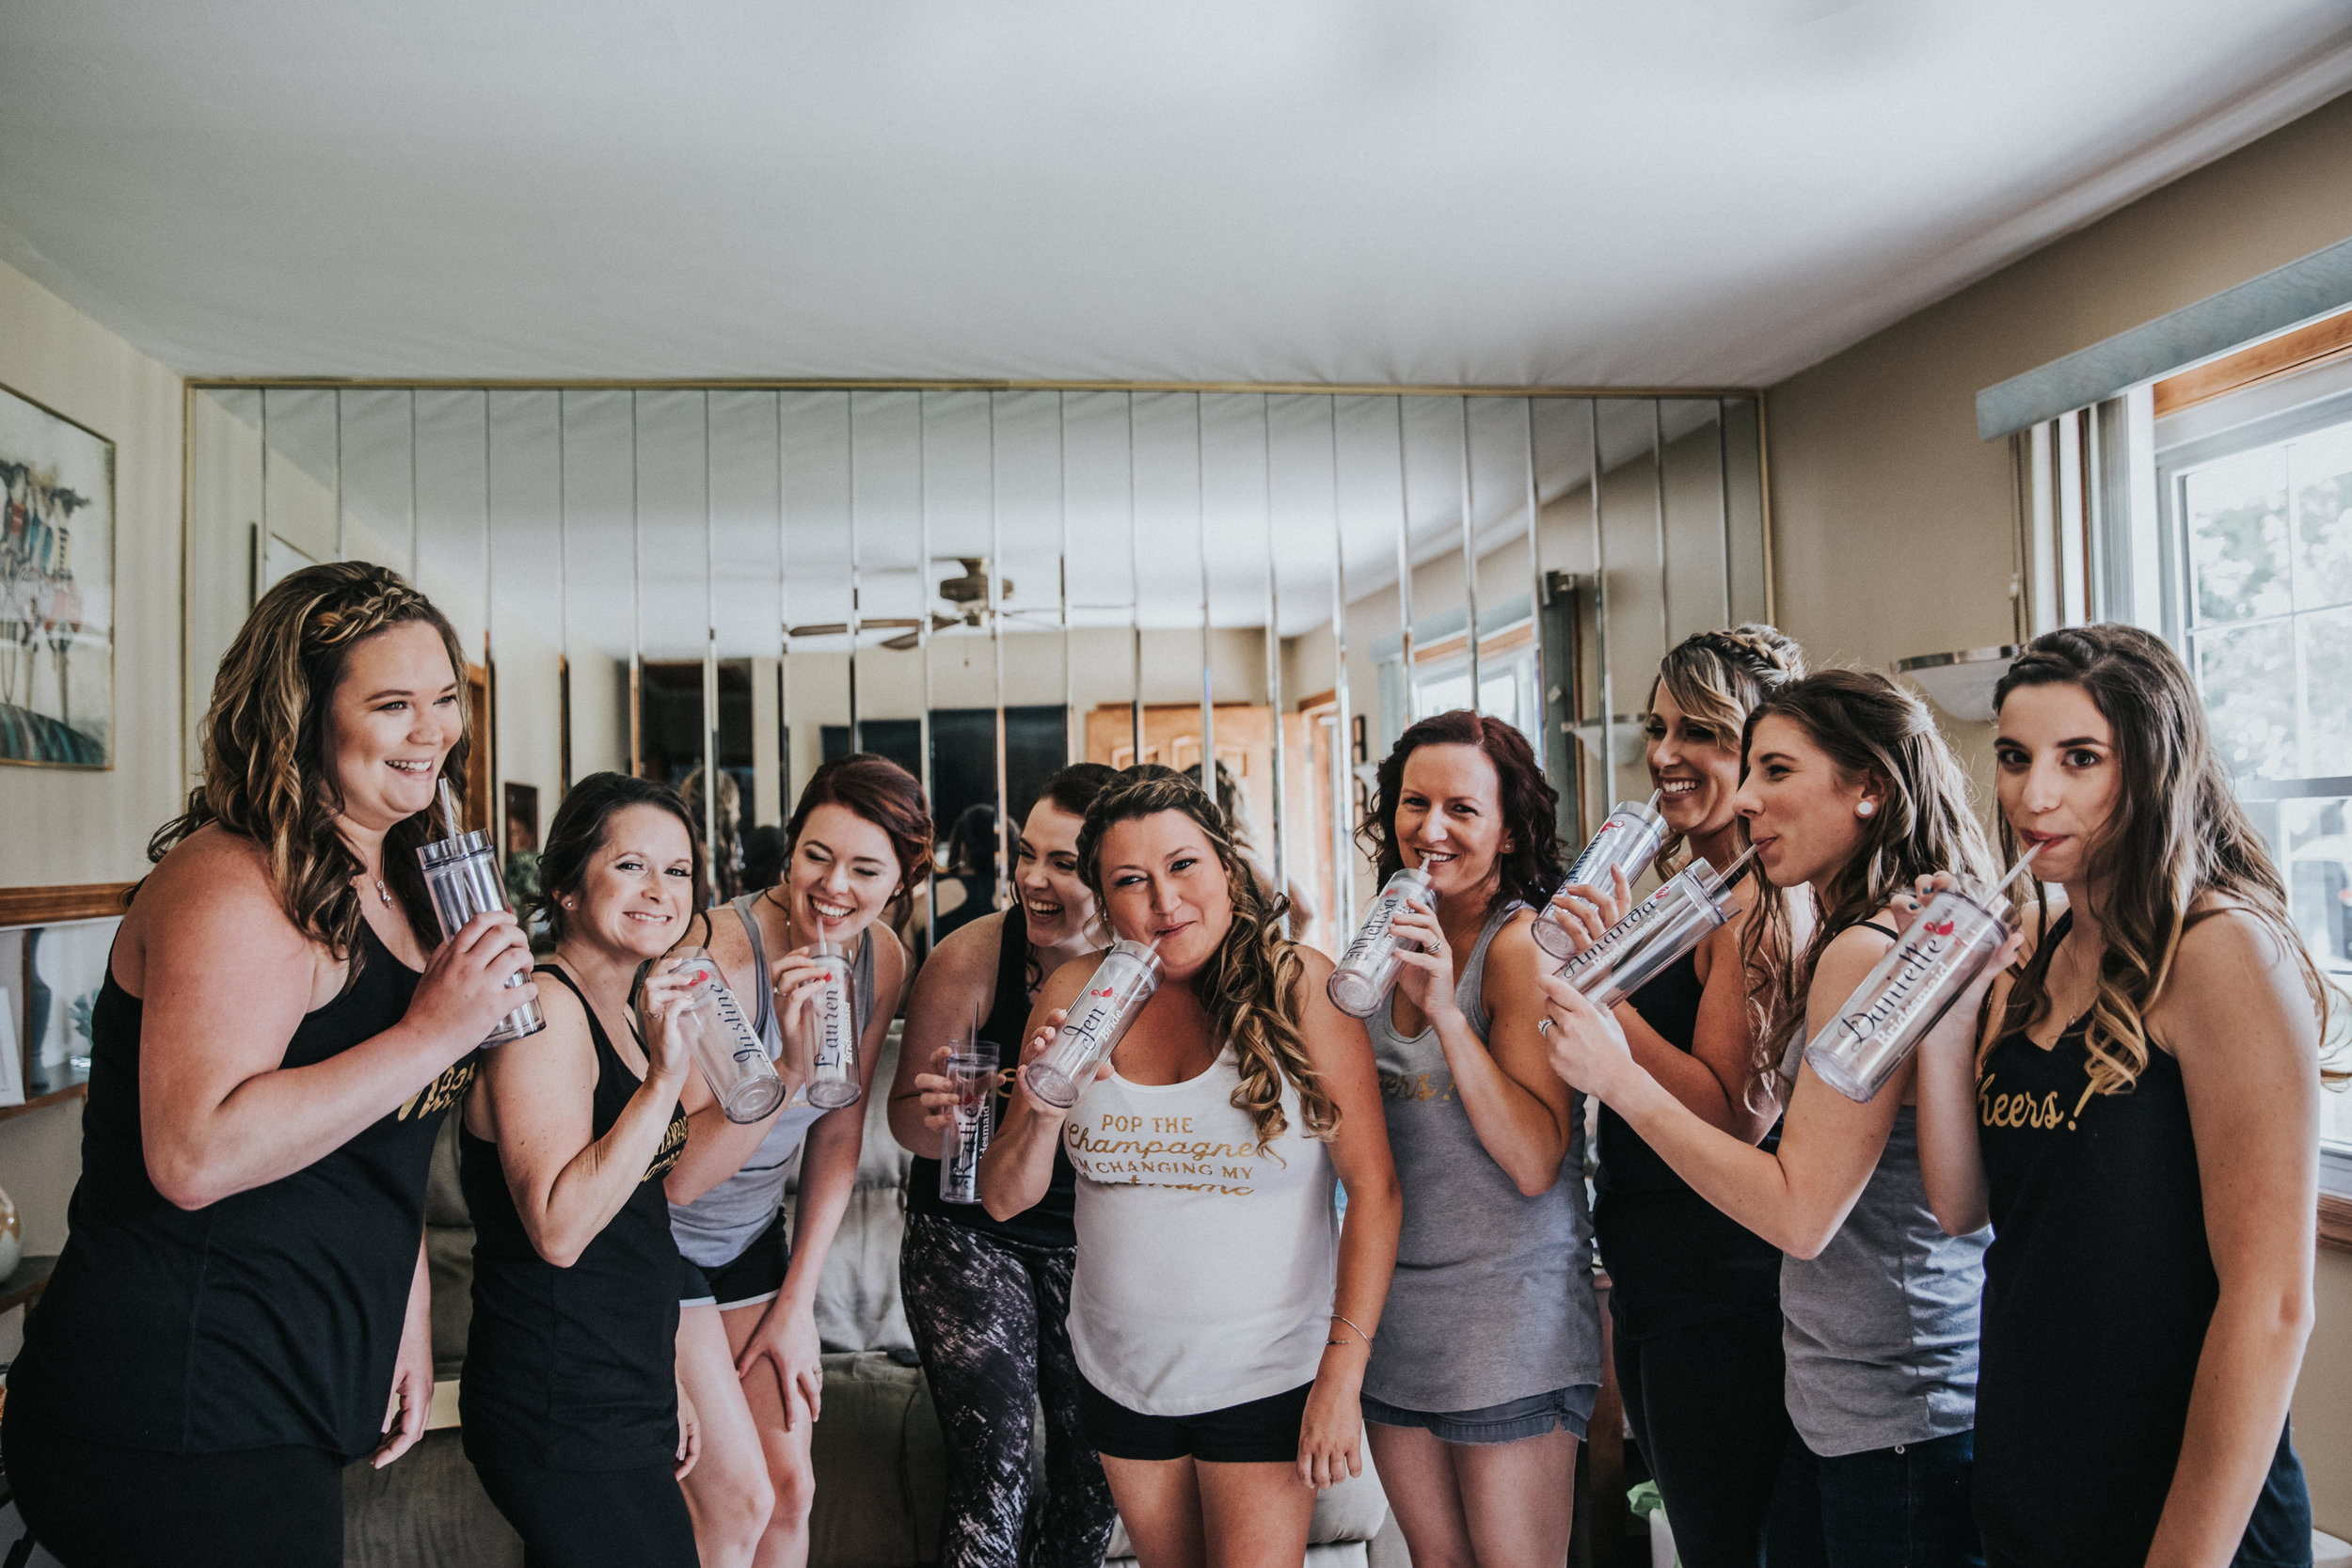 New-Jersey-Wedding-Photographer-JennaLynnPhotography-ValenzanoWinery-GettingReady-16.jpg